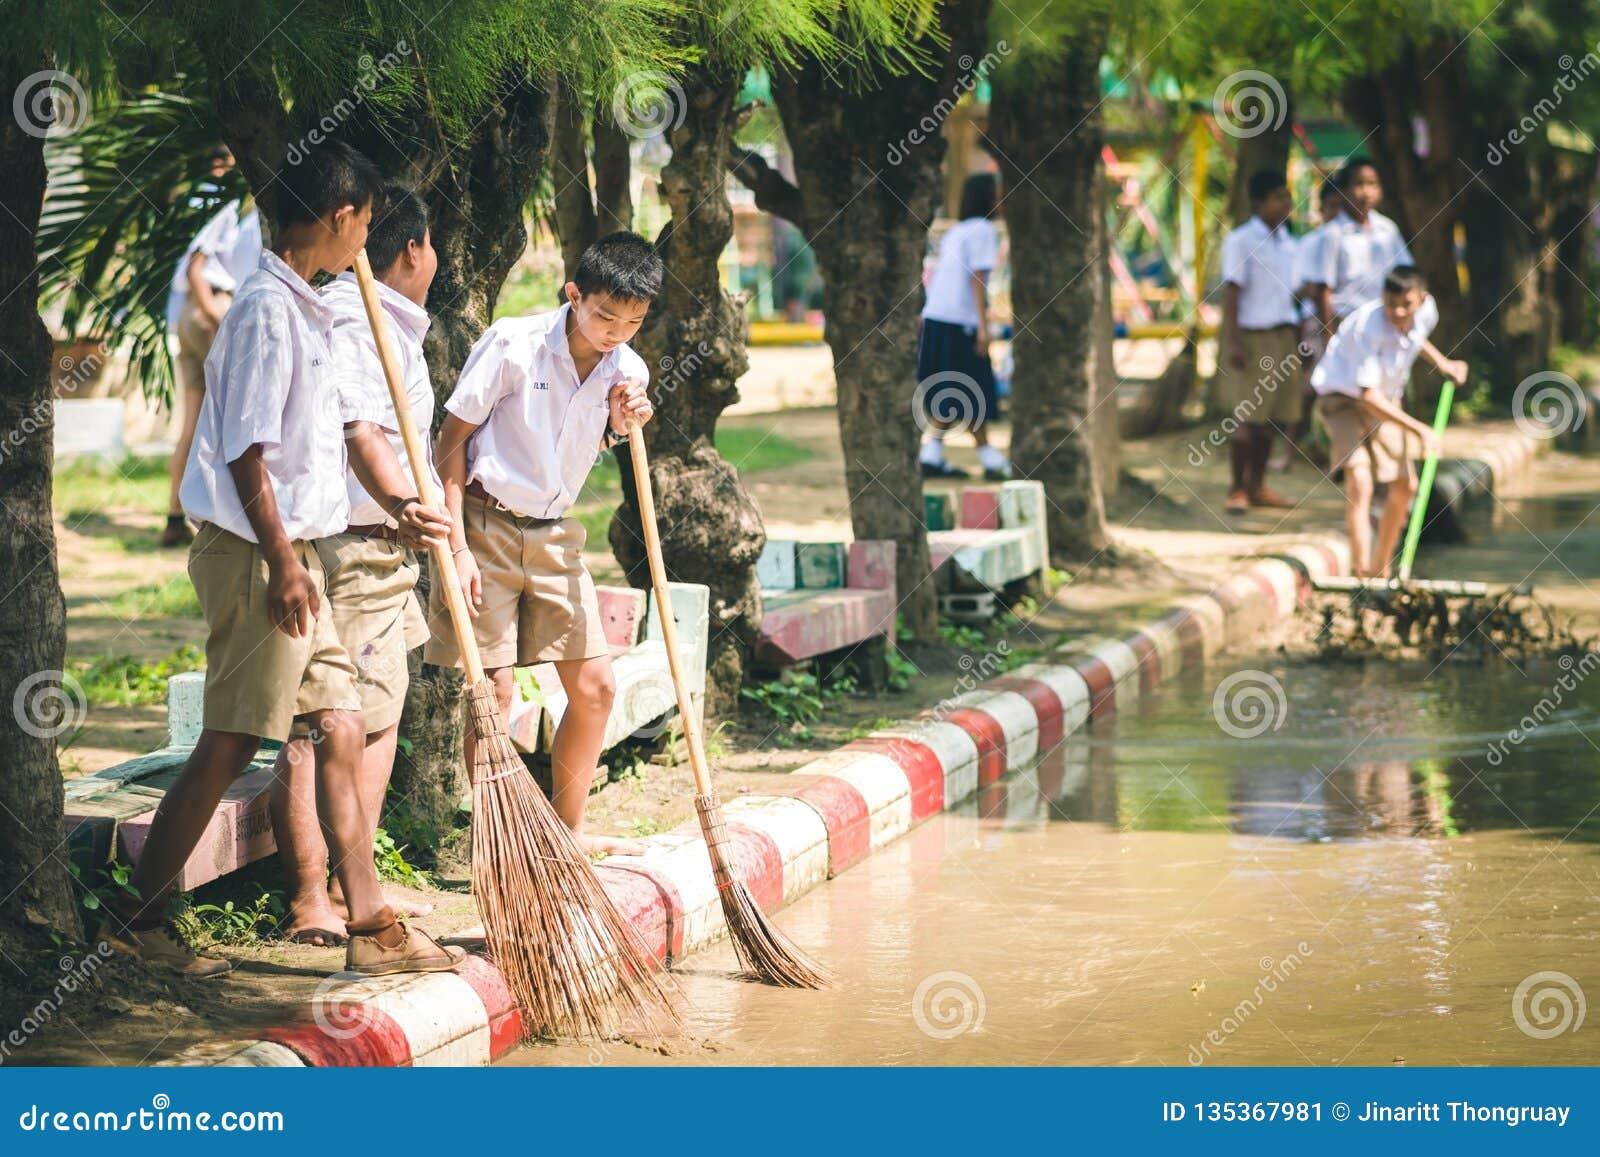 KANCHANABURI THAILAND - OKTOBER 8: De Unidentiffiedstudenten helpen